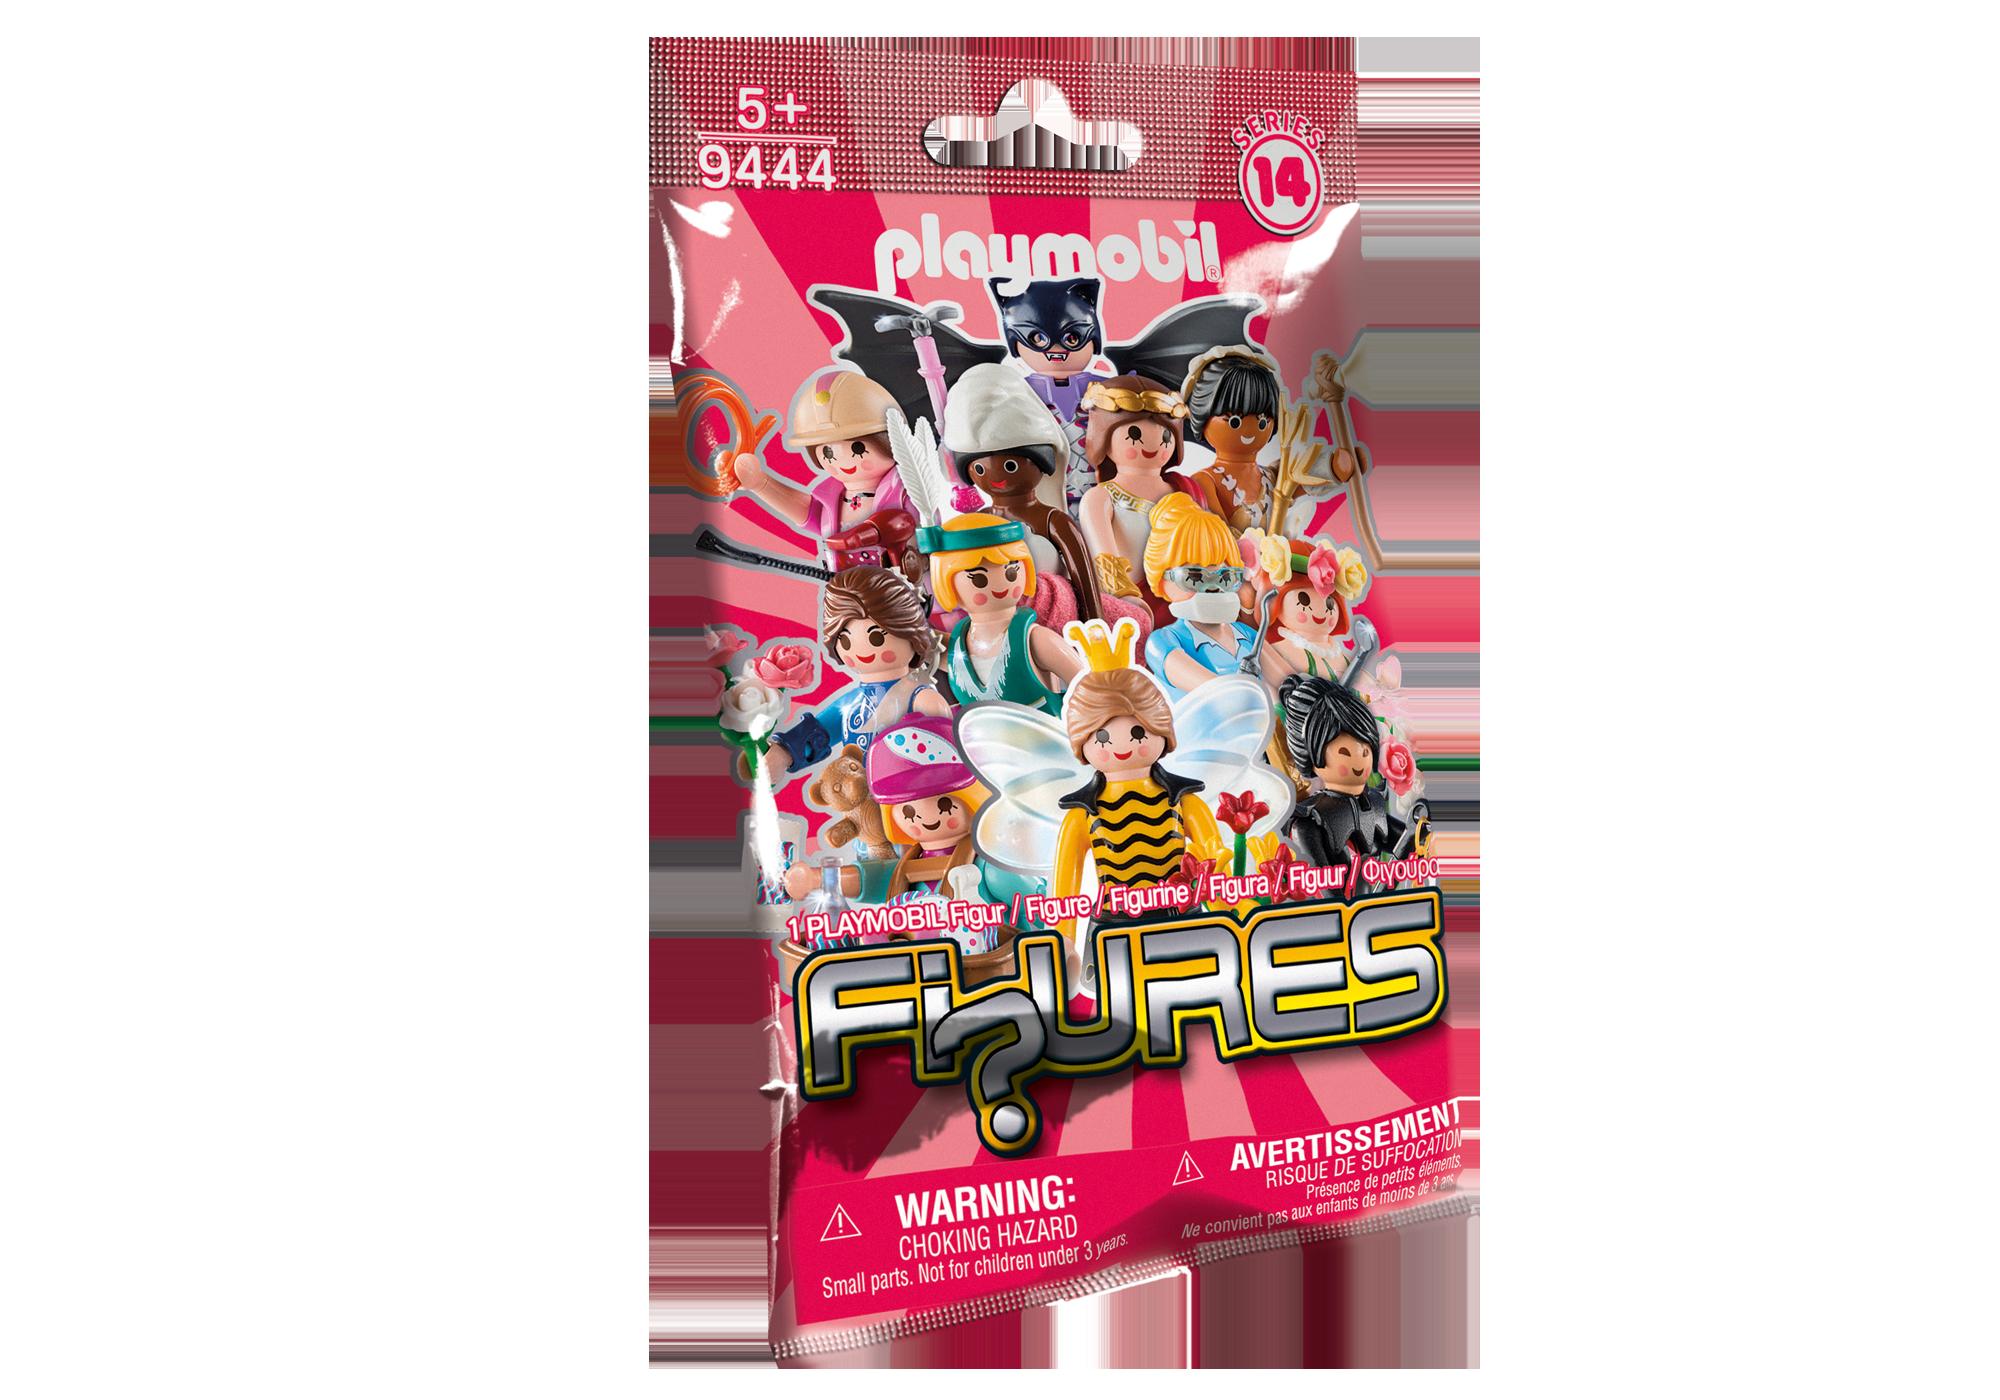 http://media.playmobil.com/i/playmobil/9444_product_detail/PLAYMOBIL-Figures Girls (Serie 14)